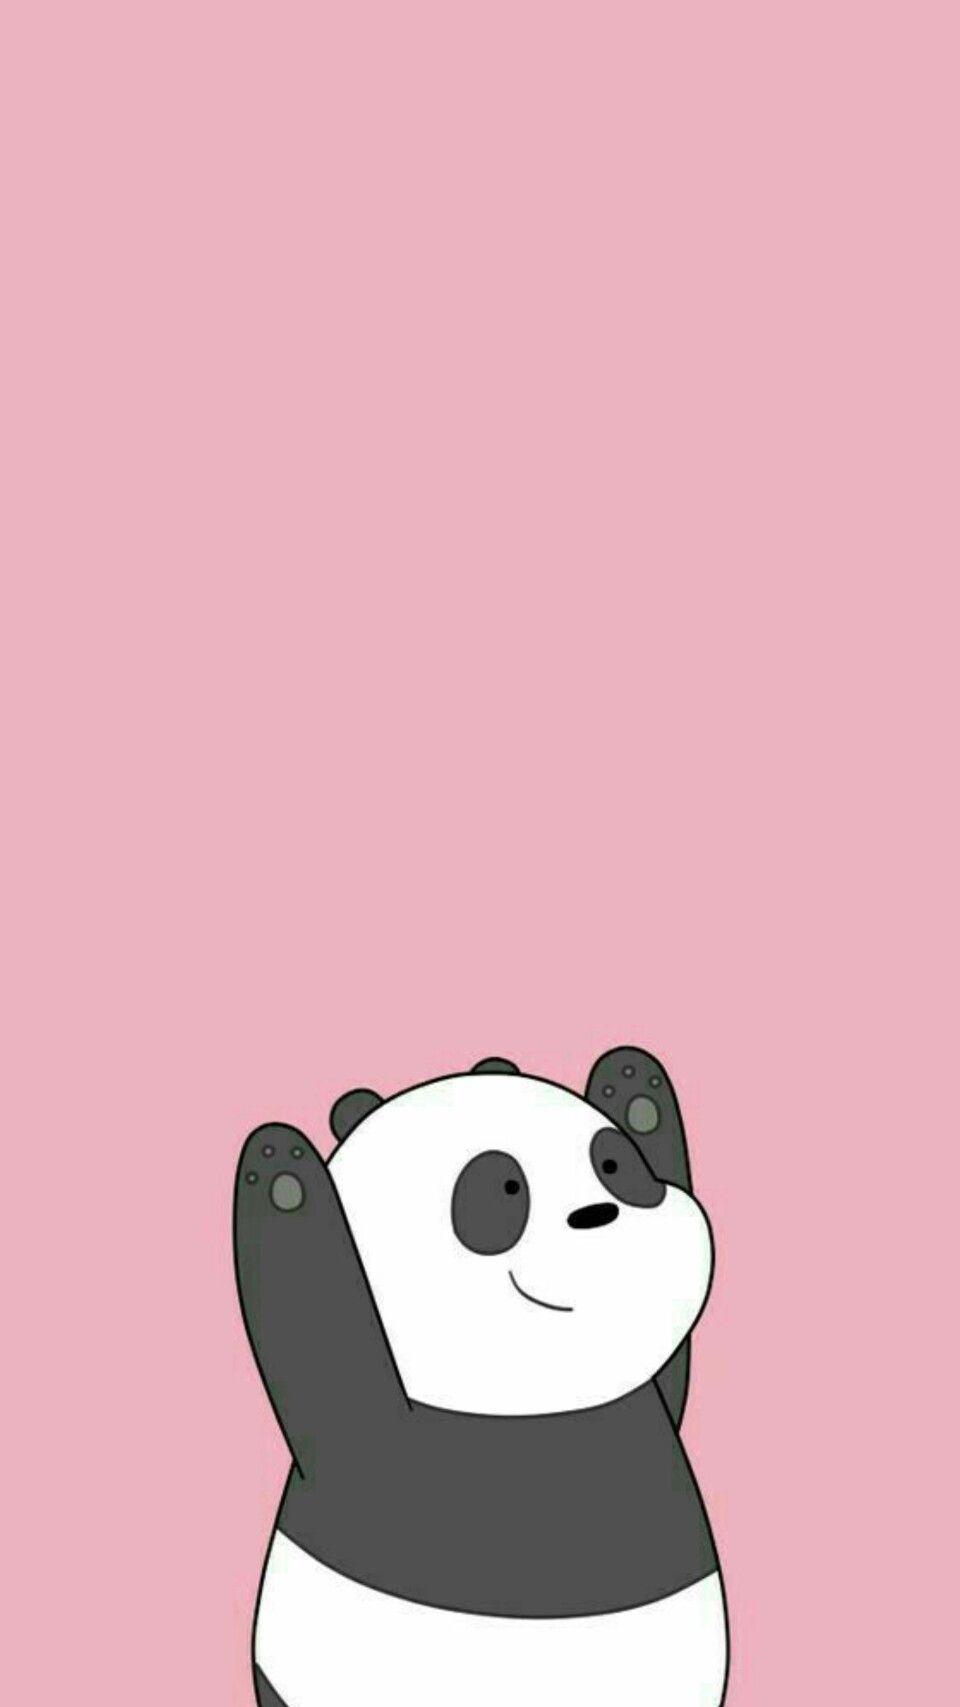 Panda Pink Wallpaper Kartun Ilustrasi Kartun Boneka Hewan Cute cute panda cartoon wallpaper